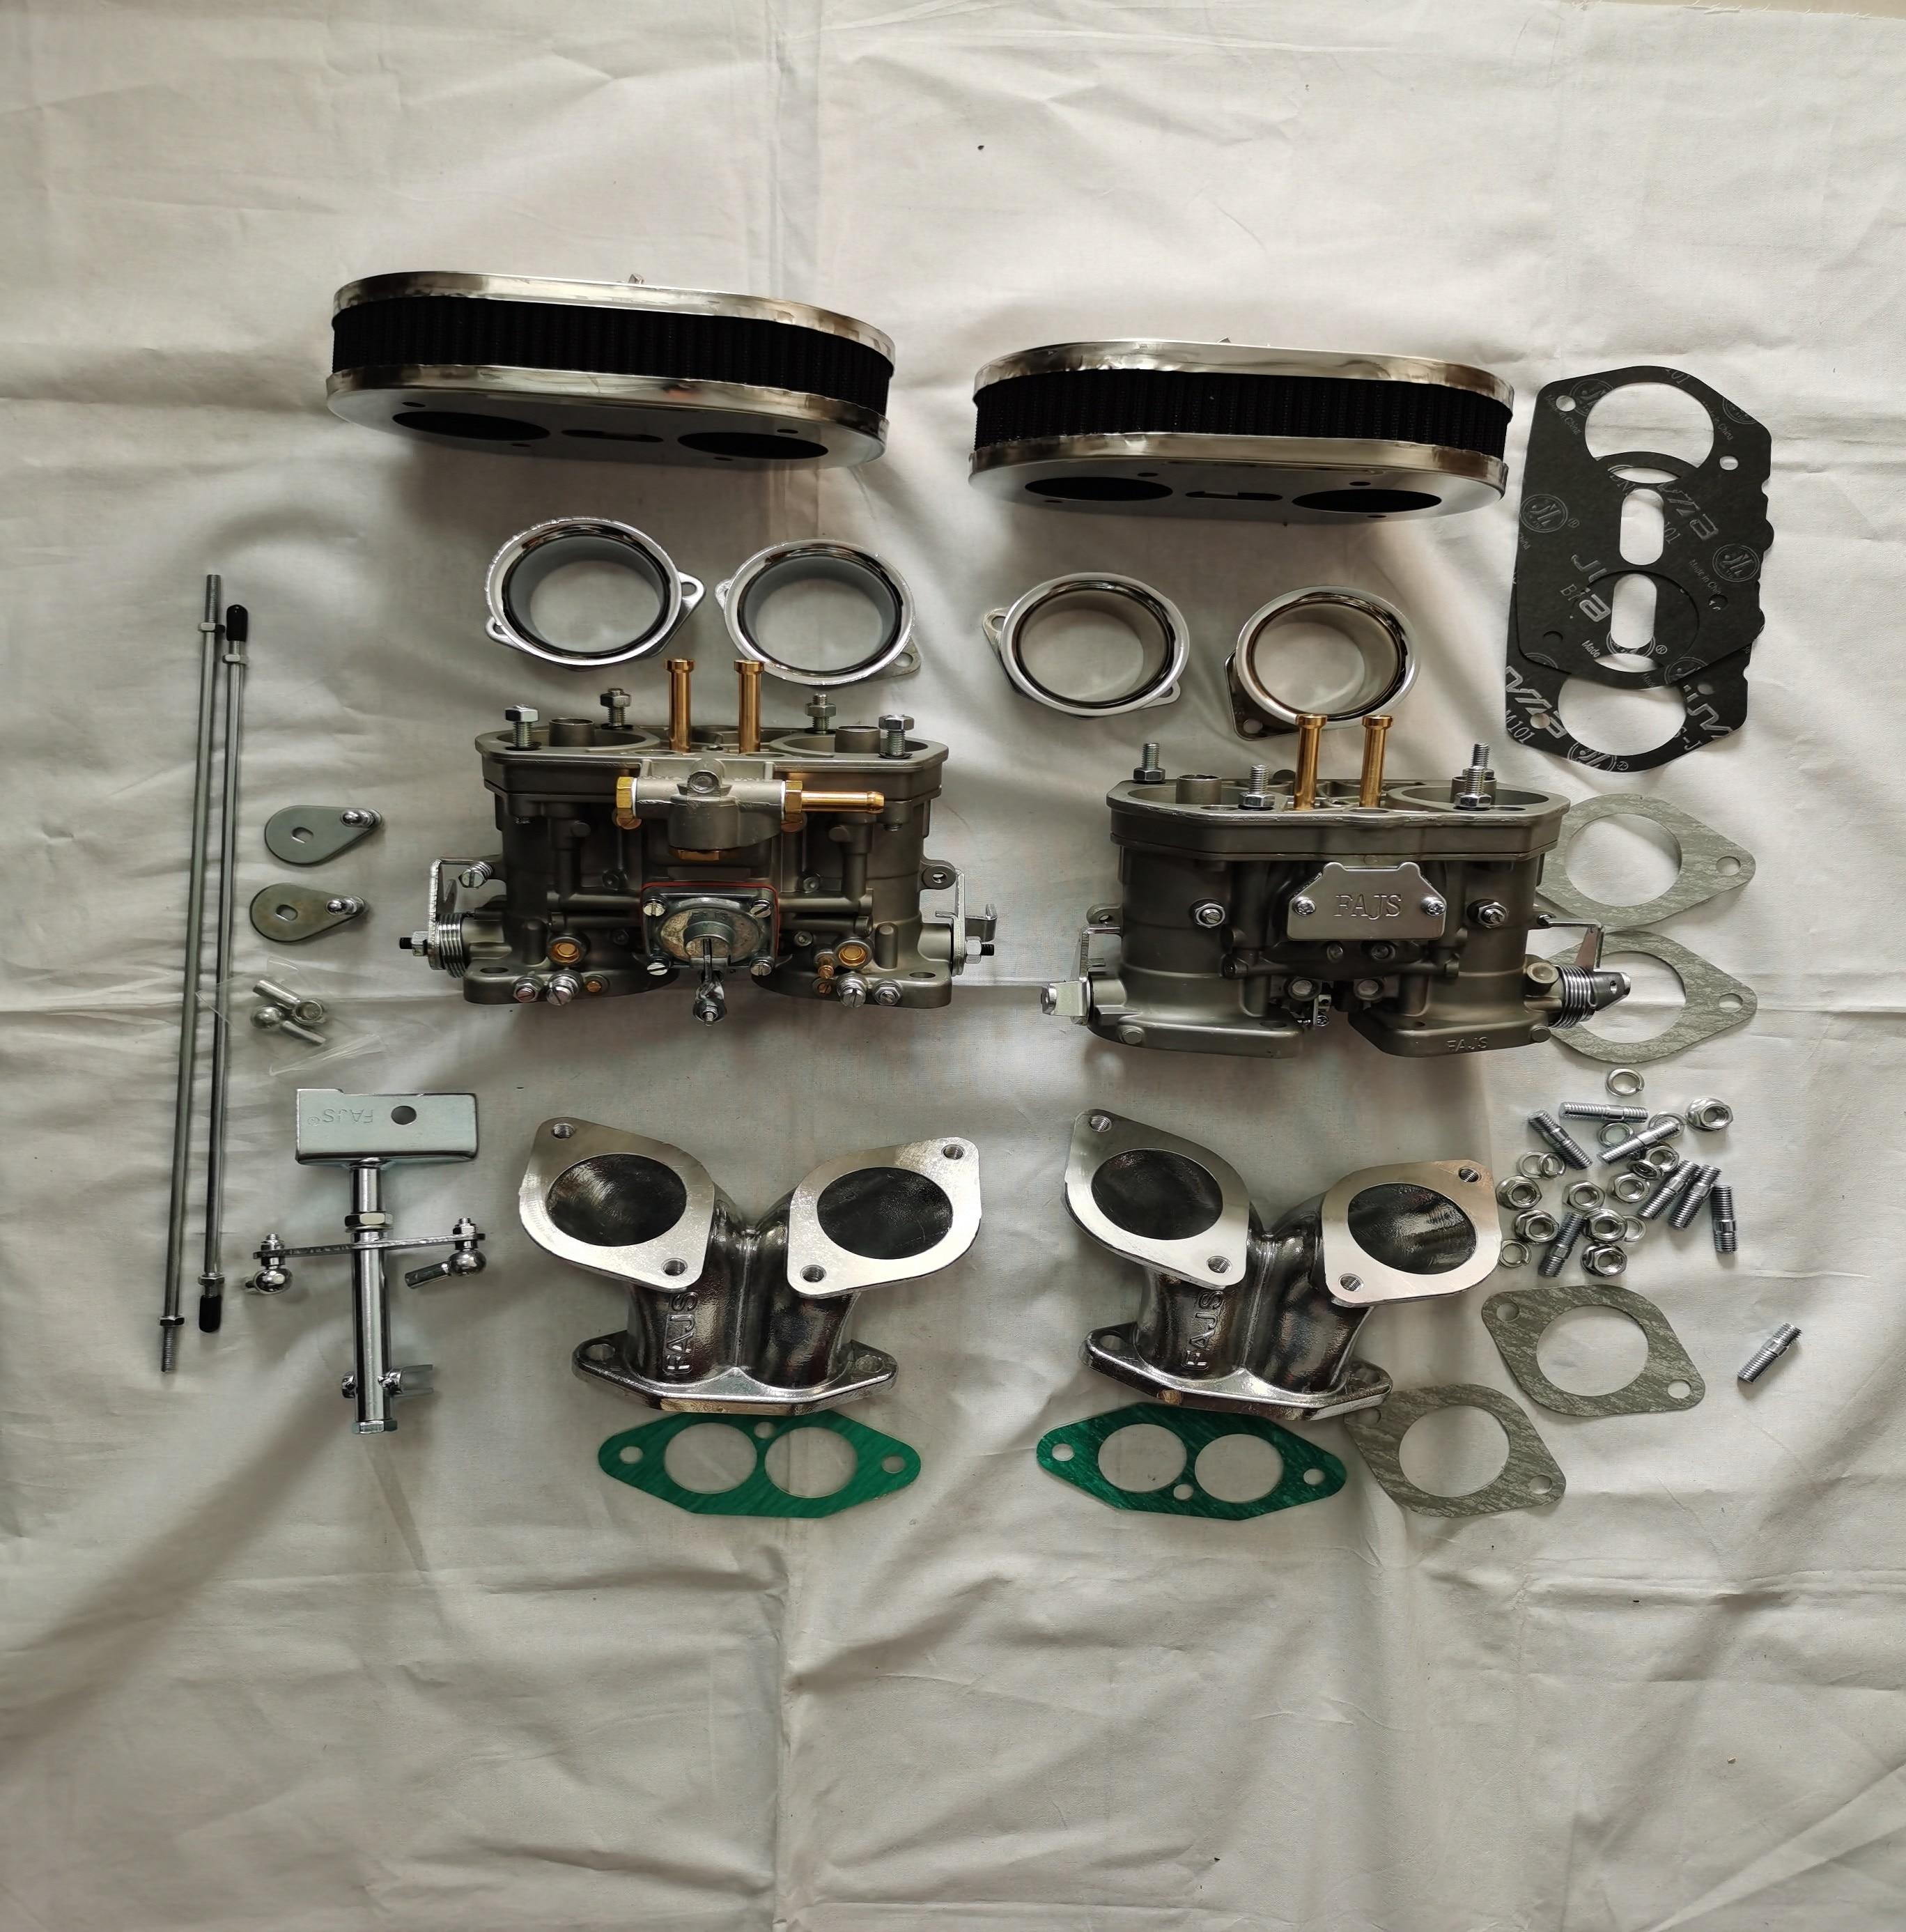 Dual fajs 44IDF carburetor for V W TYPE 3 FAJS HPMX WEBER IDF  - buy with discount